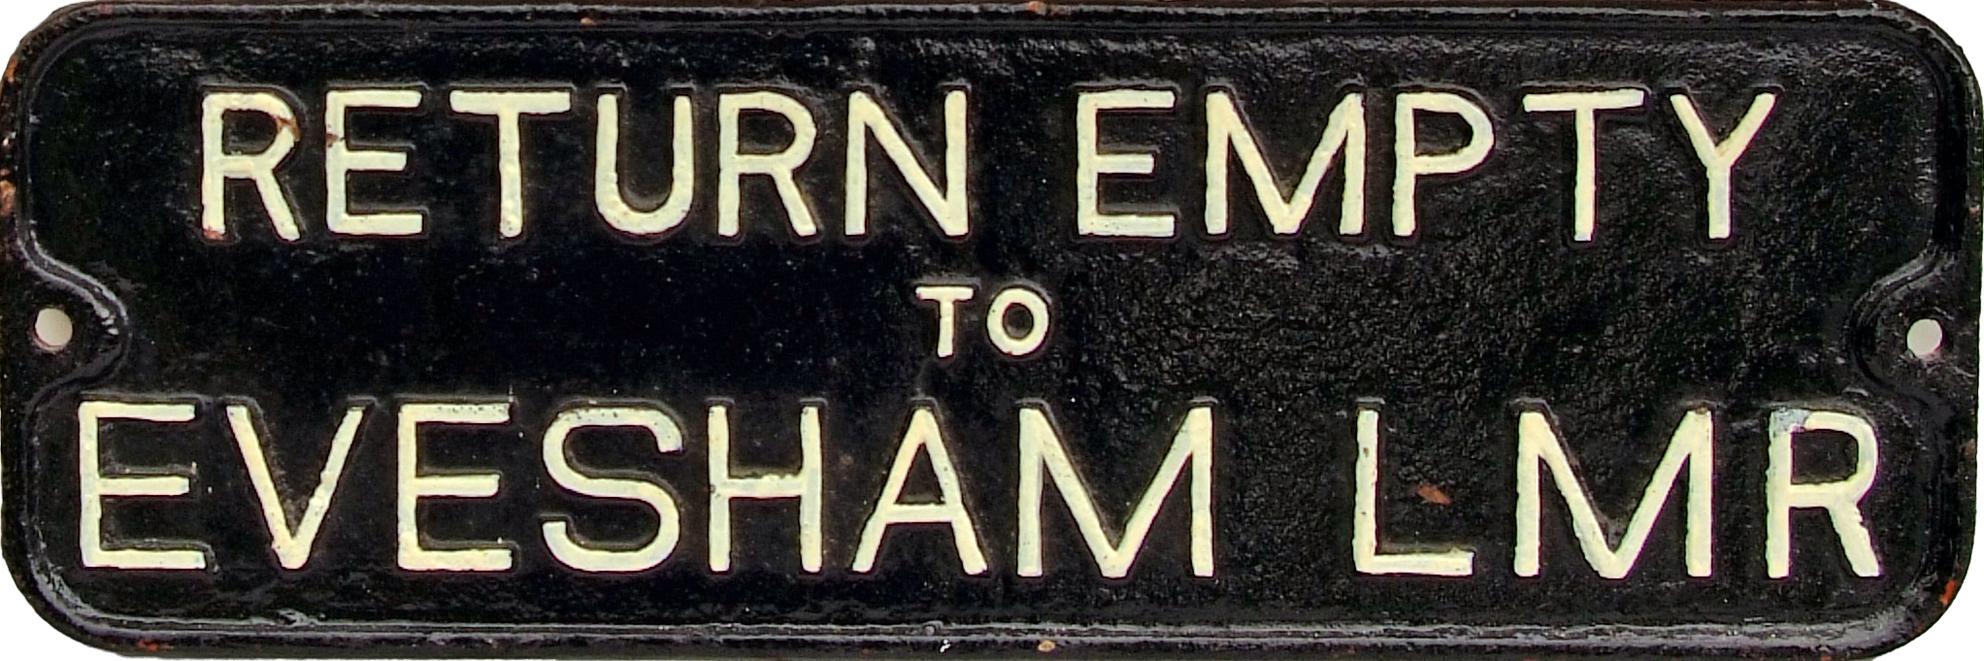 Wagon Plate, C/I 'Return Empty To Evesham LMR'.